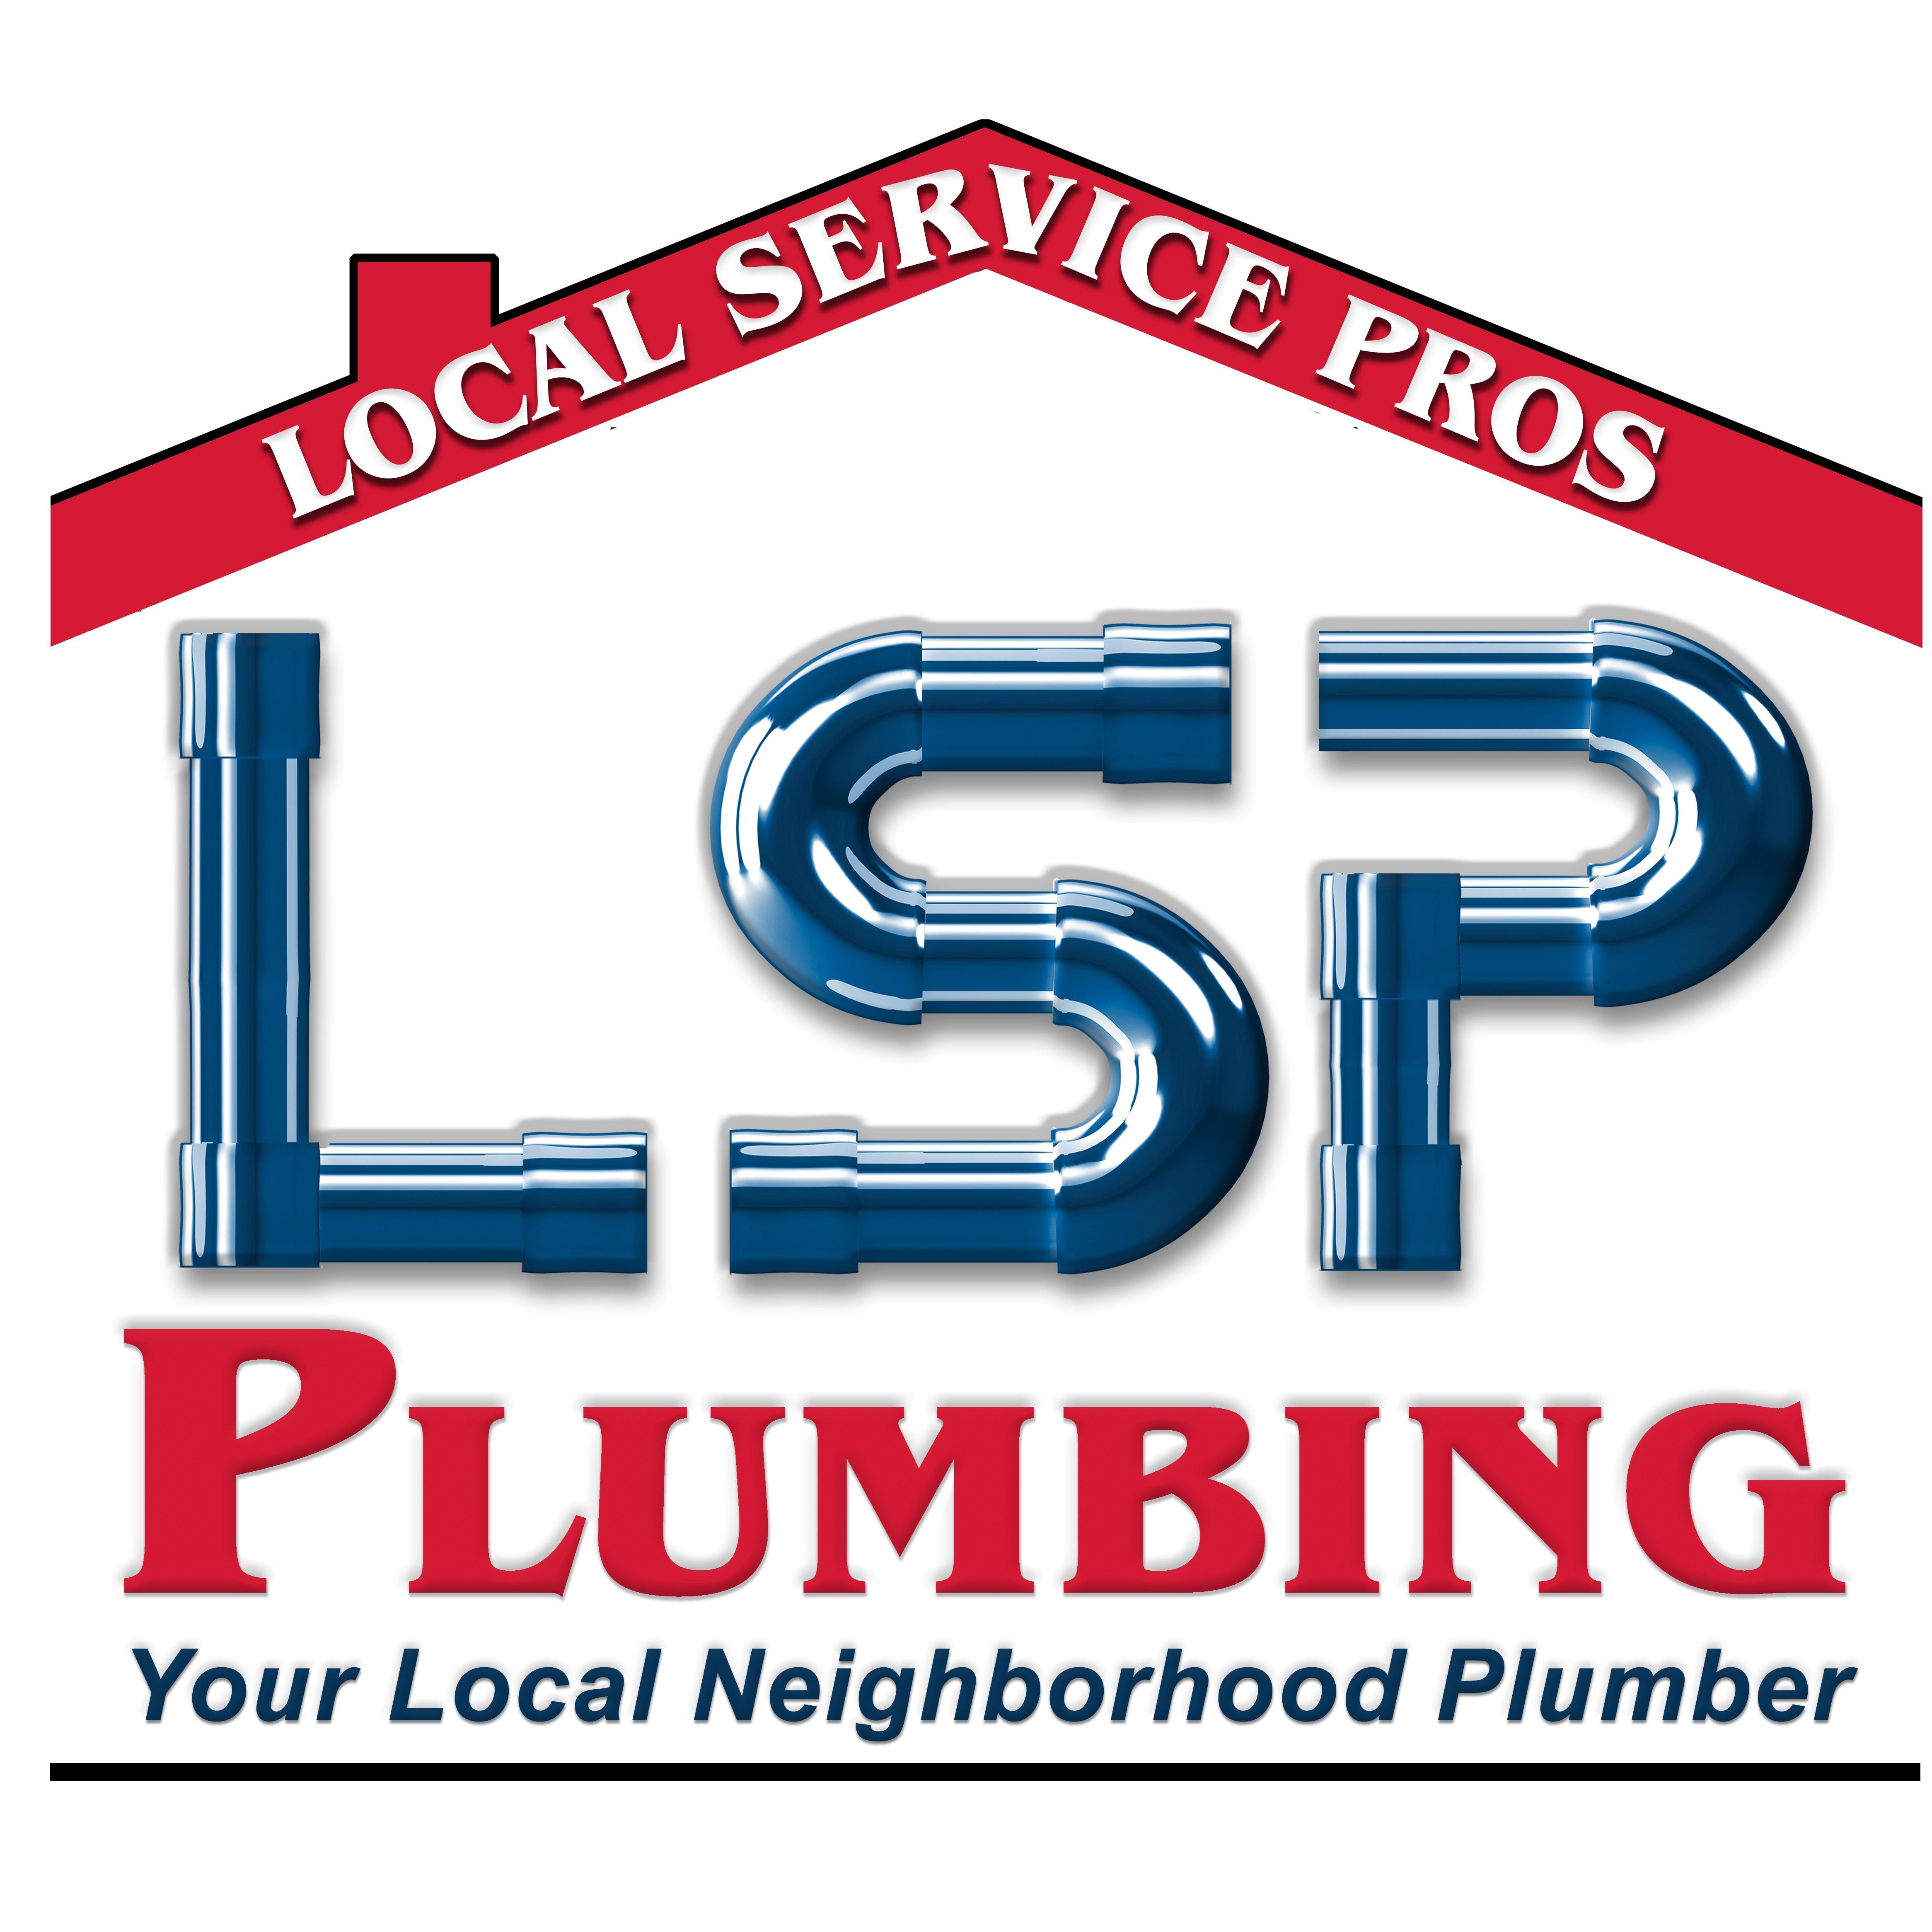 Local Service Pro Plumbing